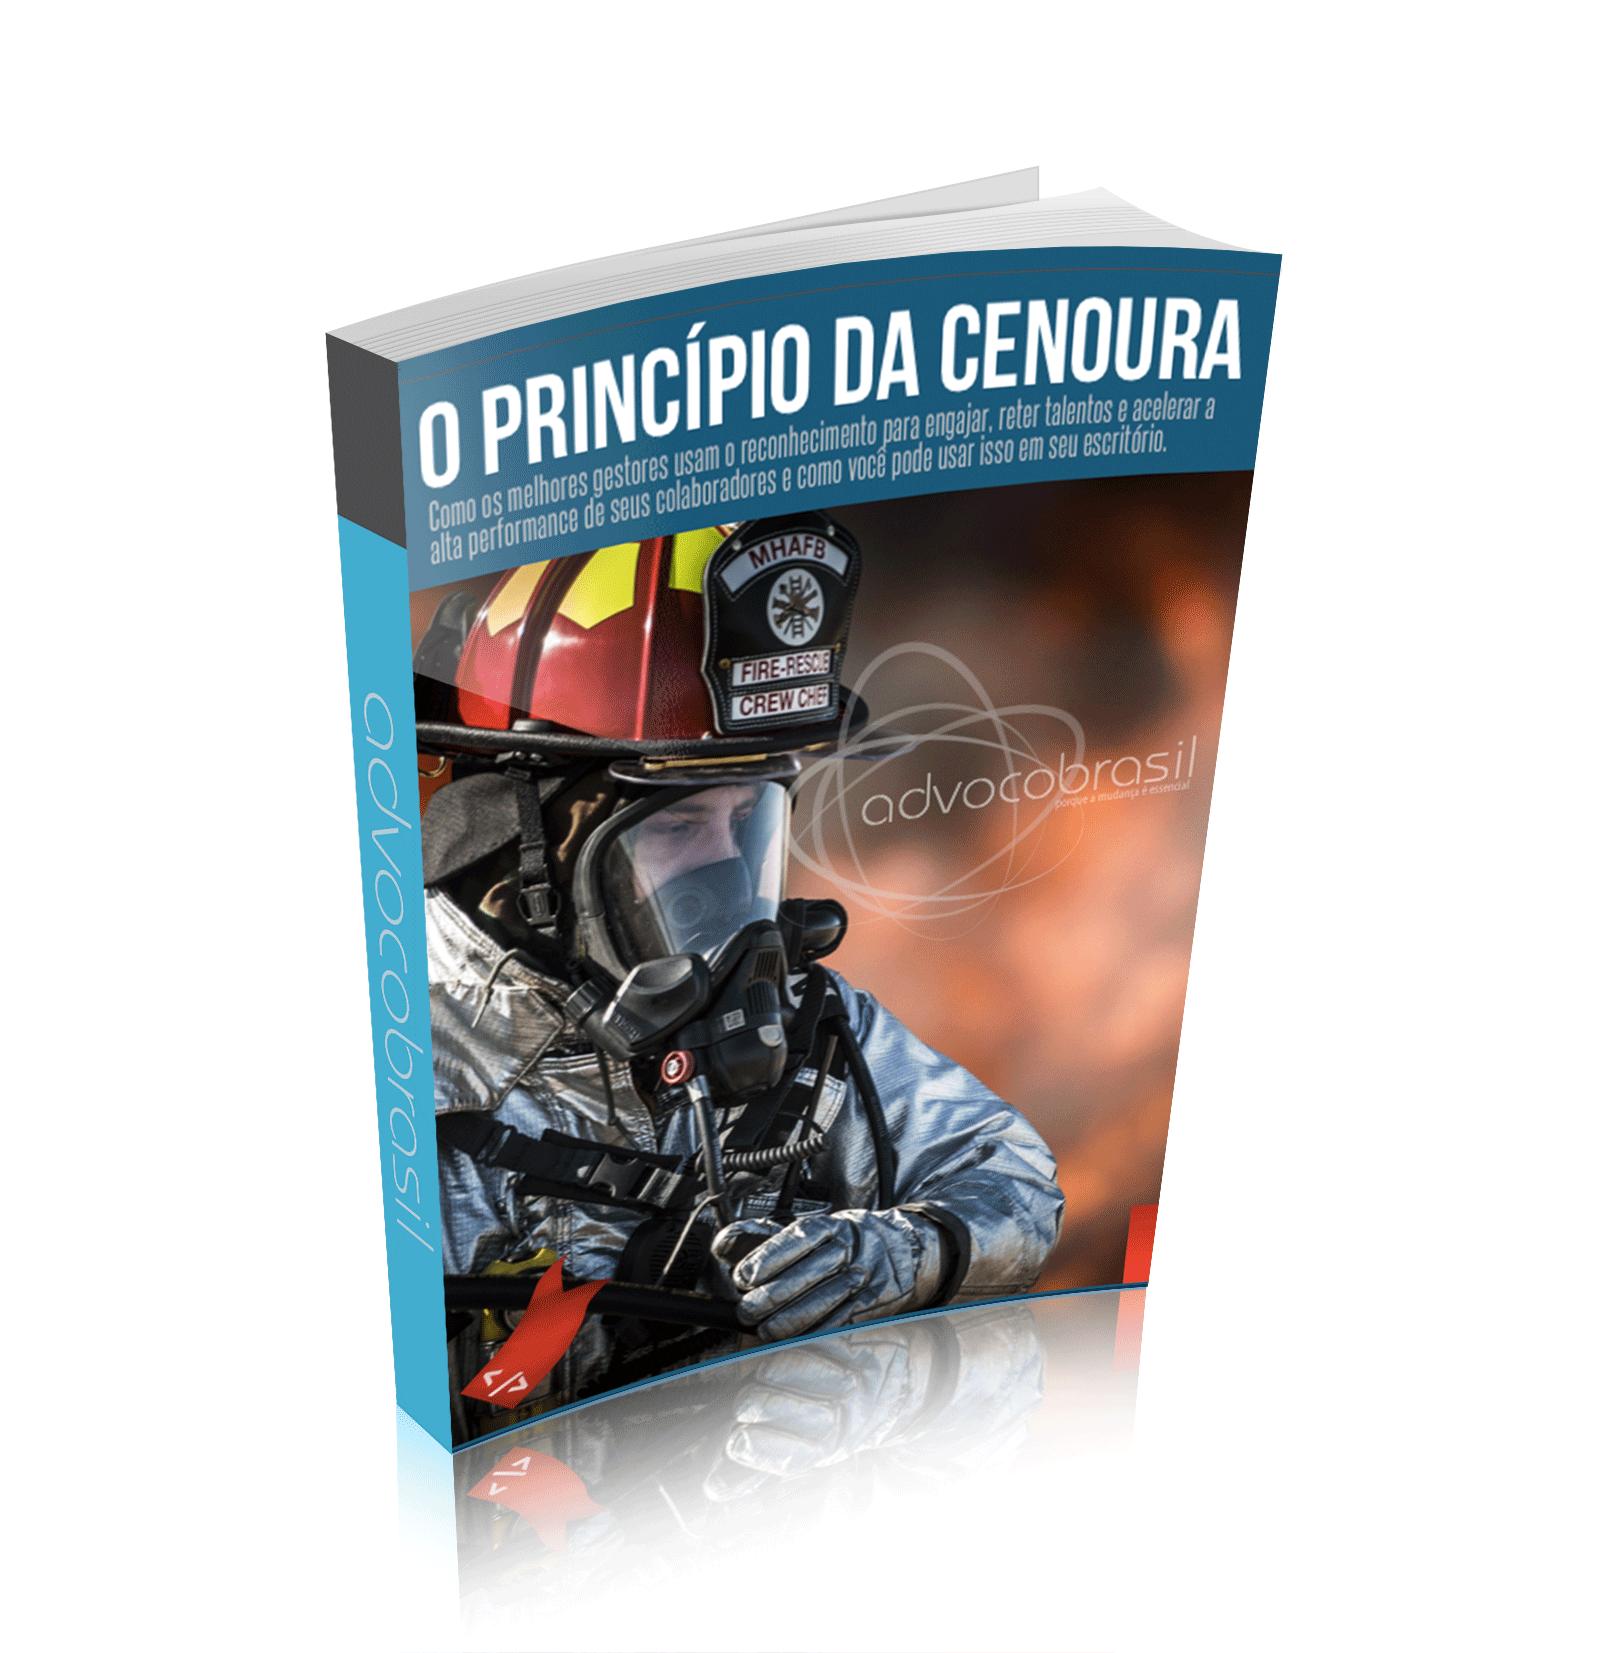 advocobrasil_o_principio_da_cenoura_ebook